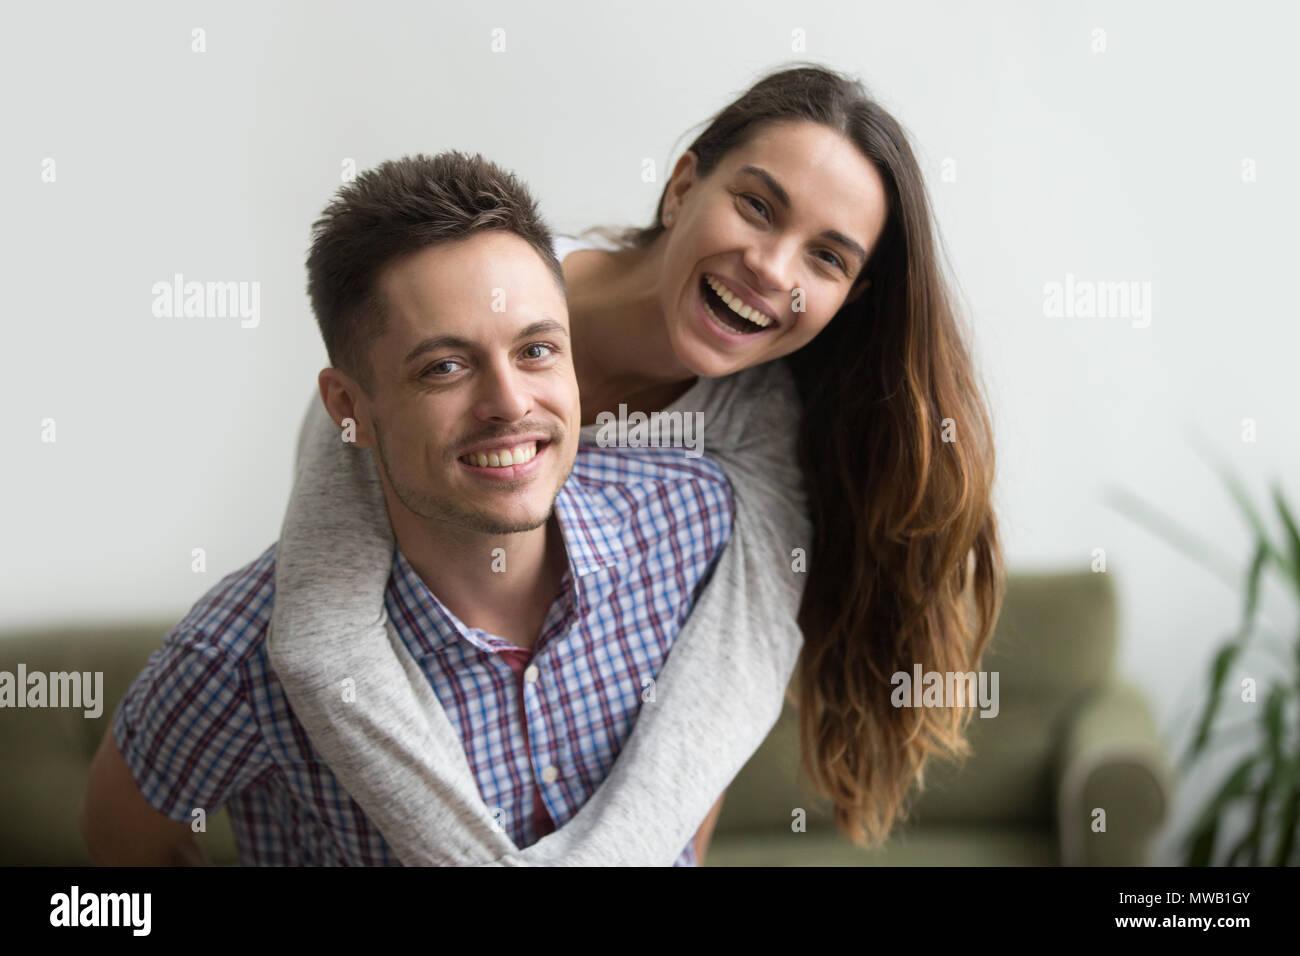 allegro dating Suggerimenti dating uomo ebreo